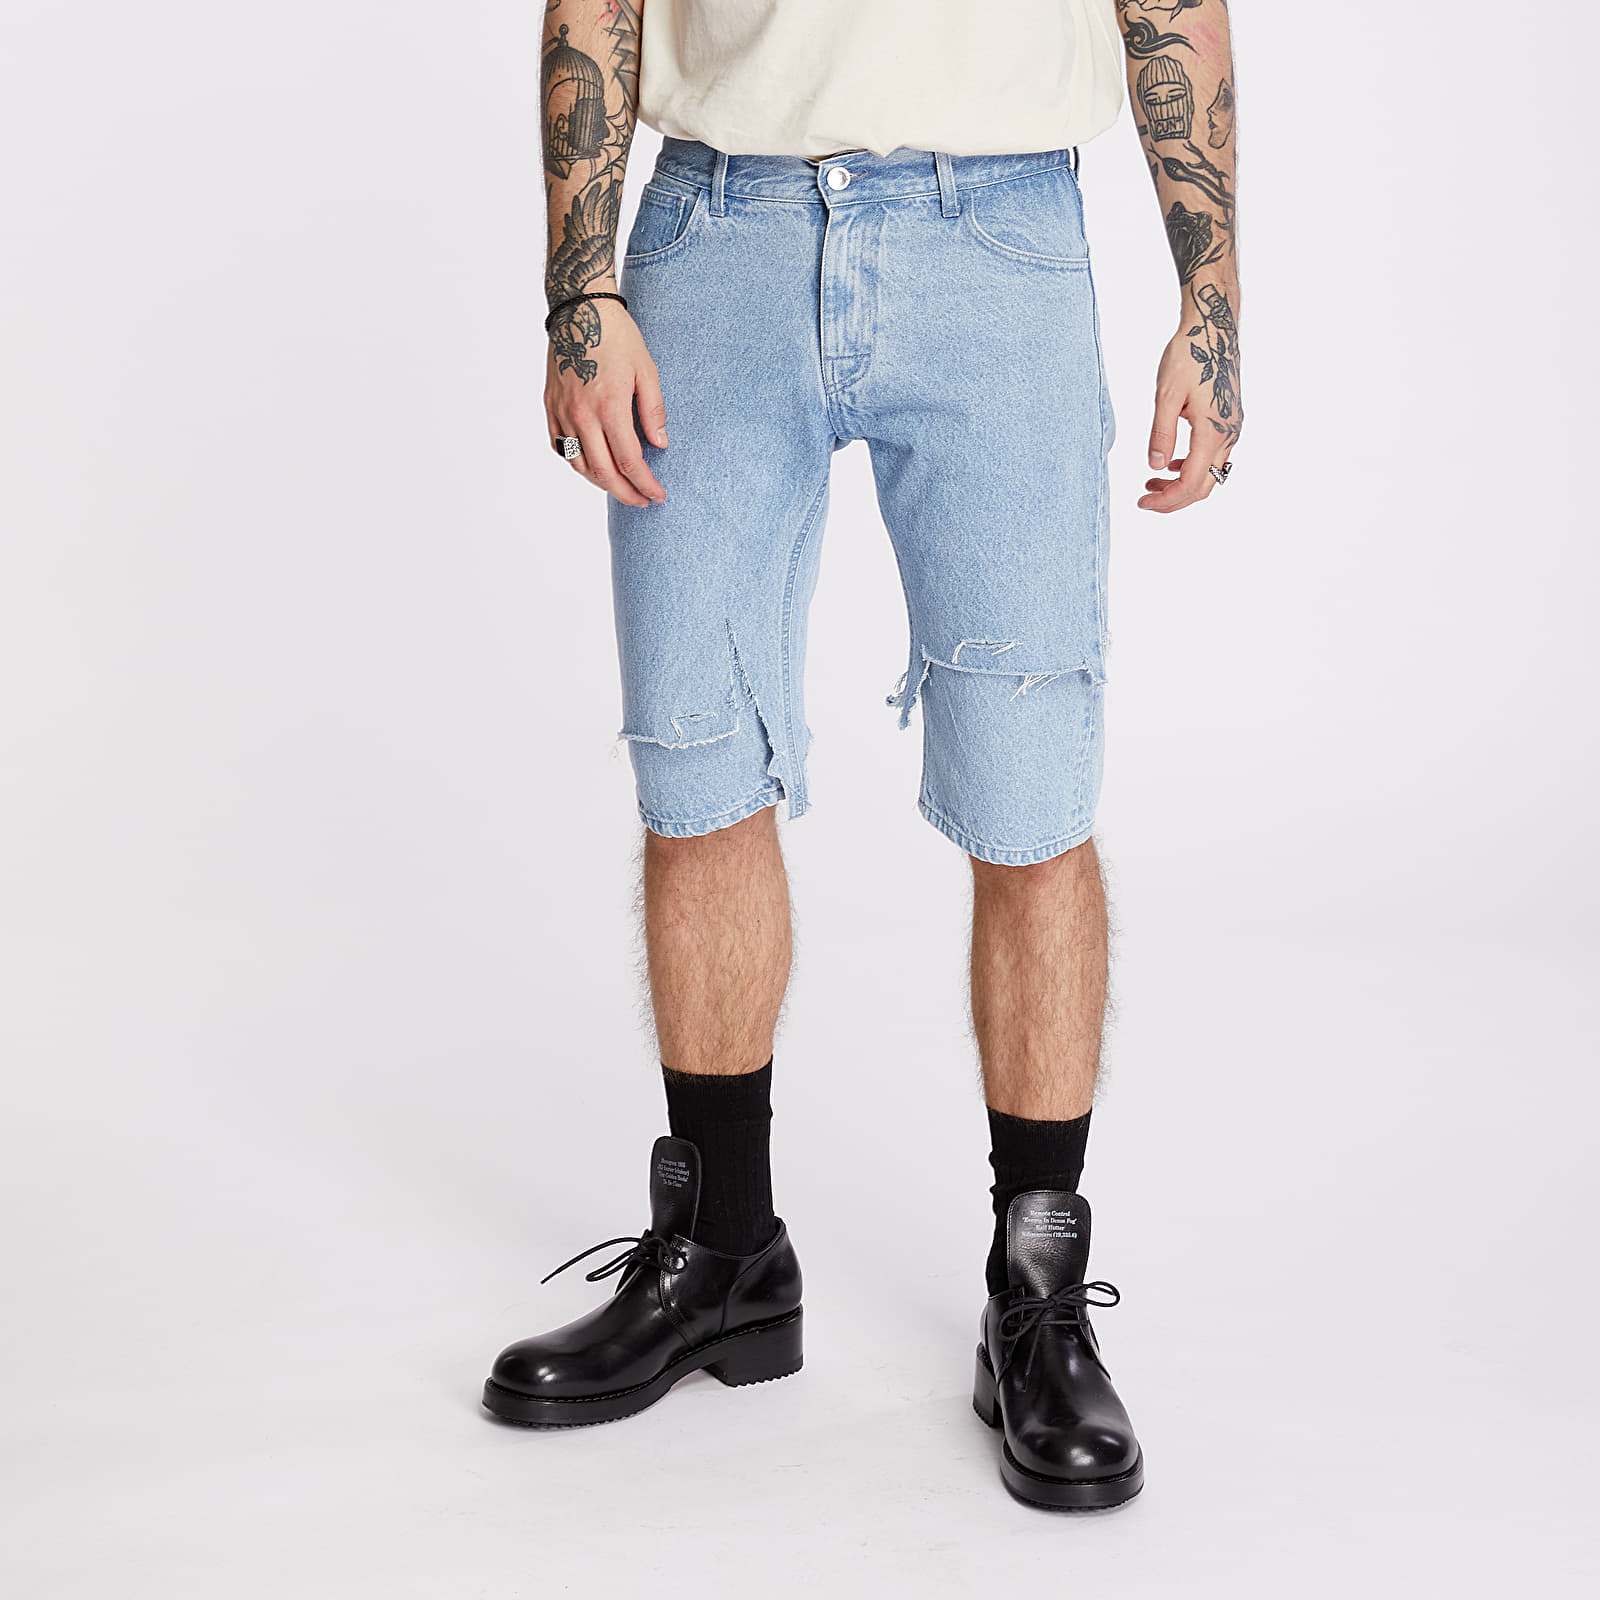 Šortky RAF SIMONS Slim Fit Destroyed Denim Shorts Blue